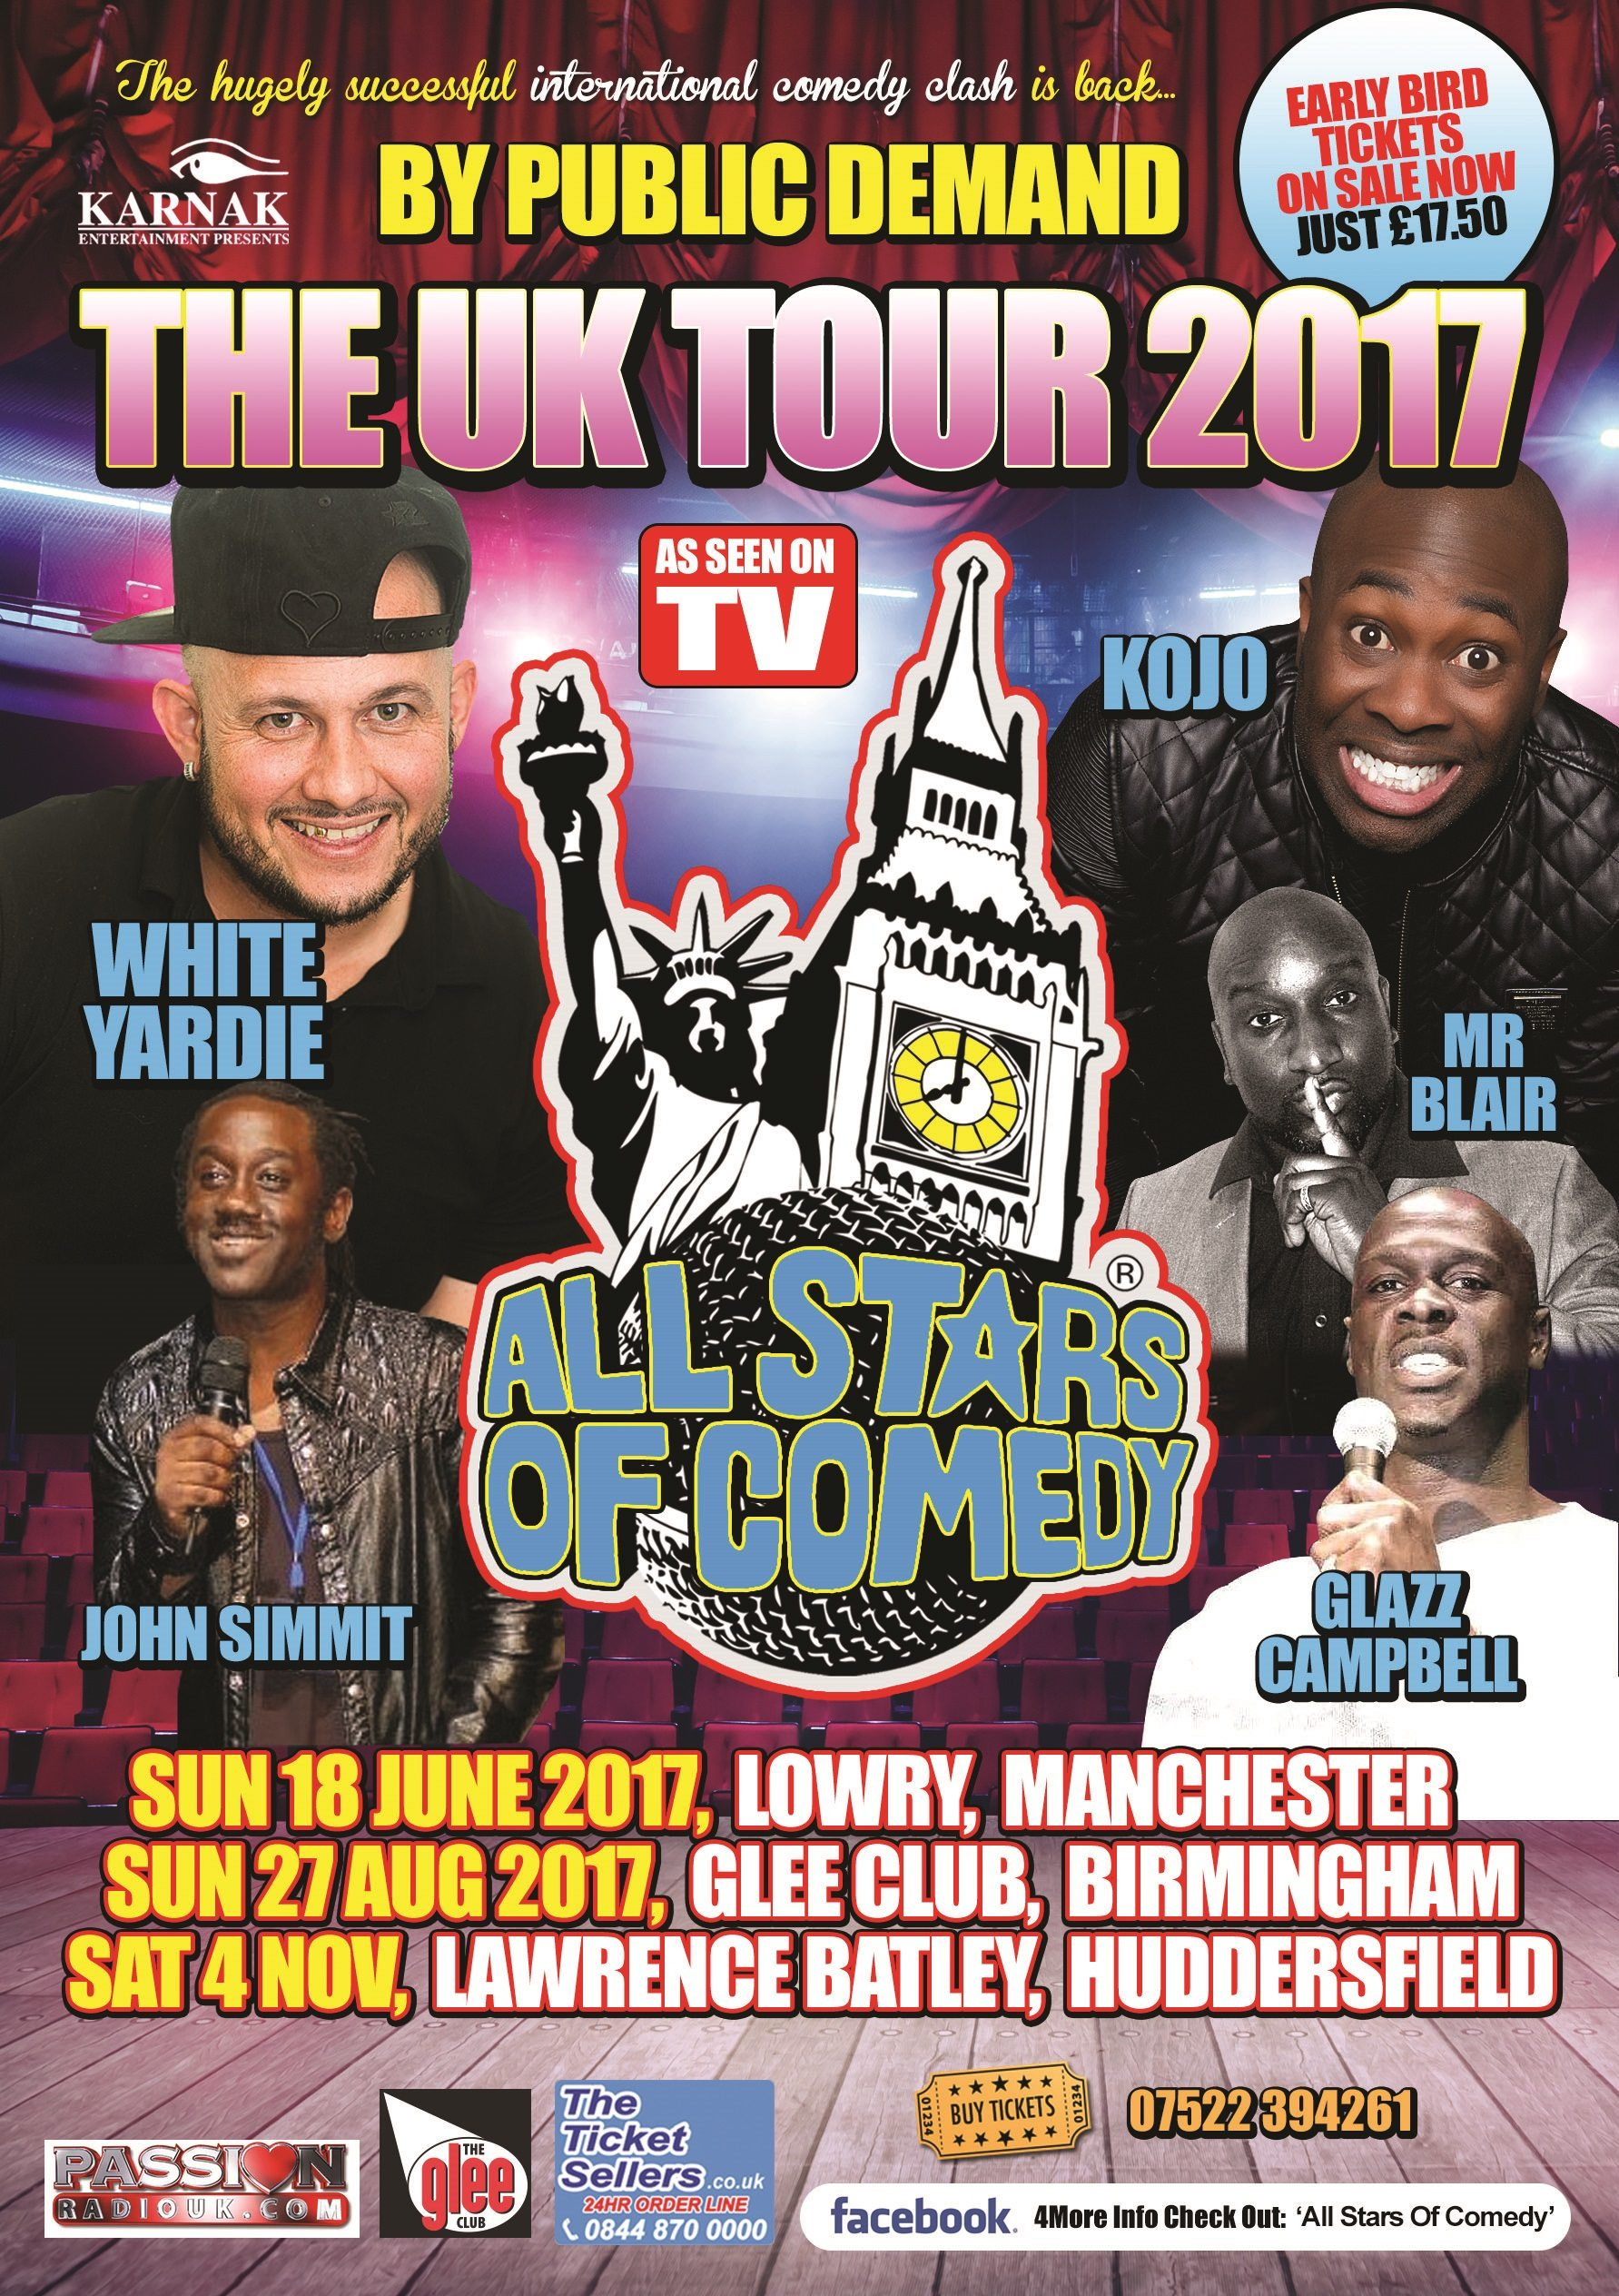 All Stars Of Comedy KOJO & White Yardie 2017 UK Tour | Blacknet UK